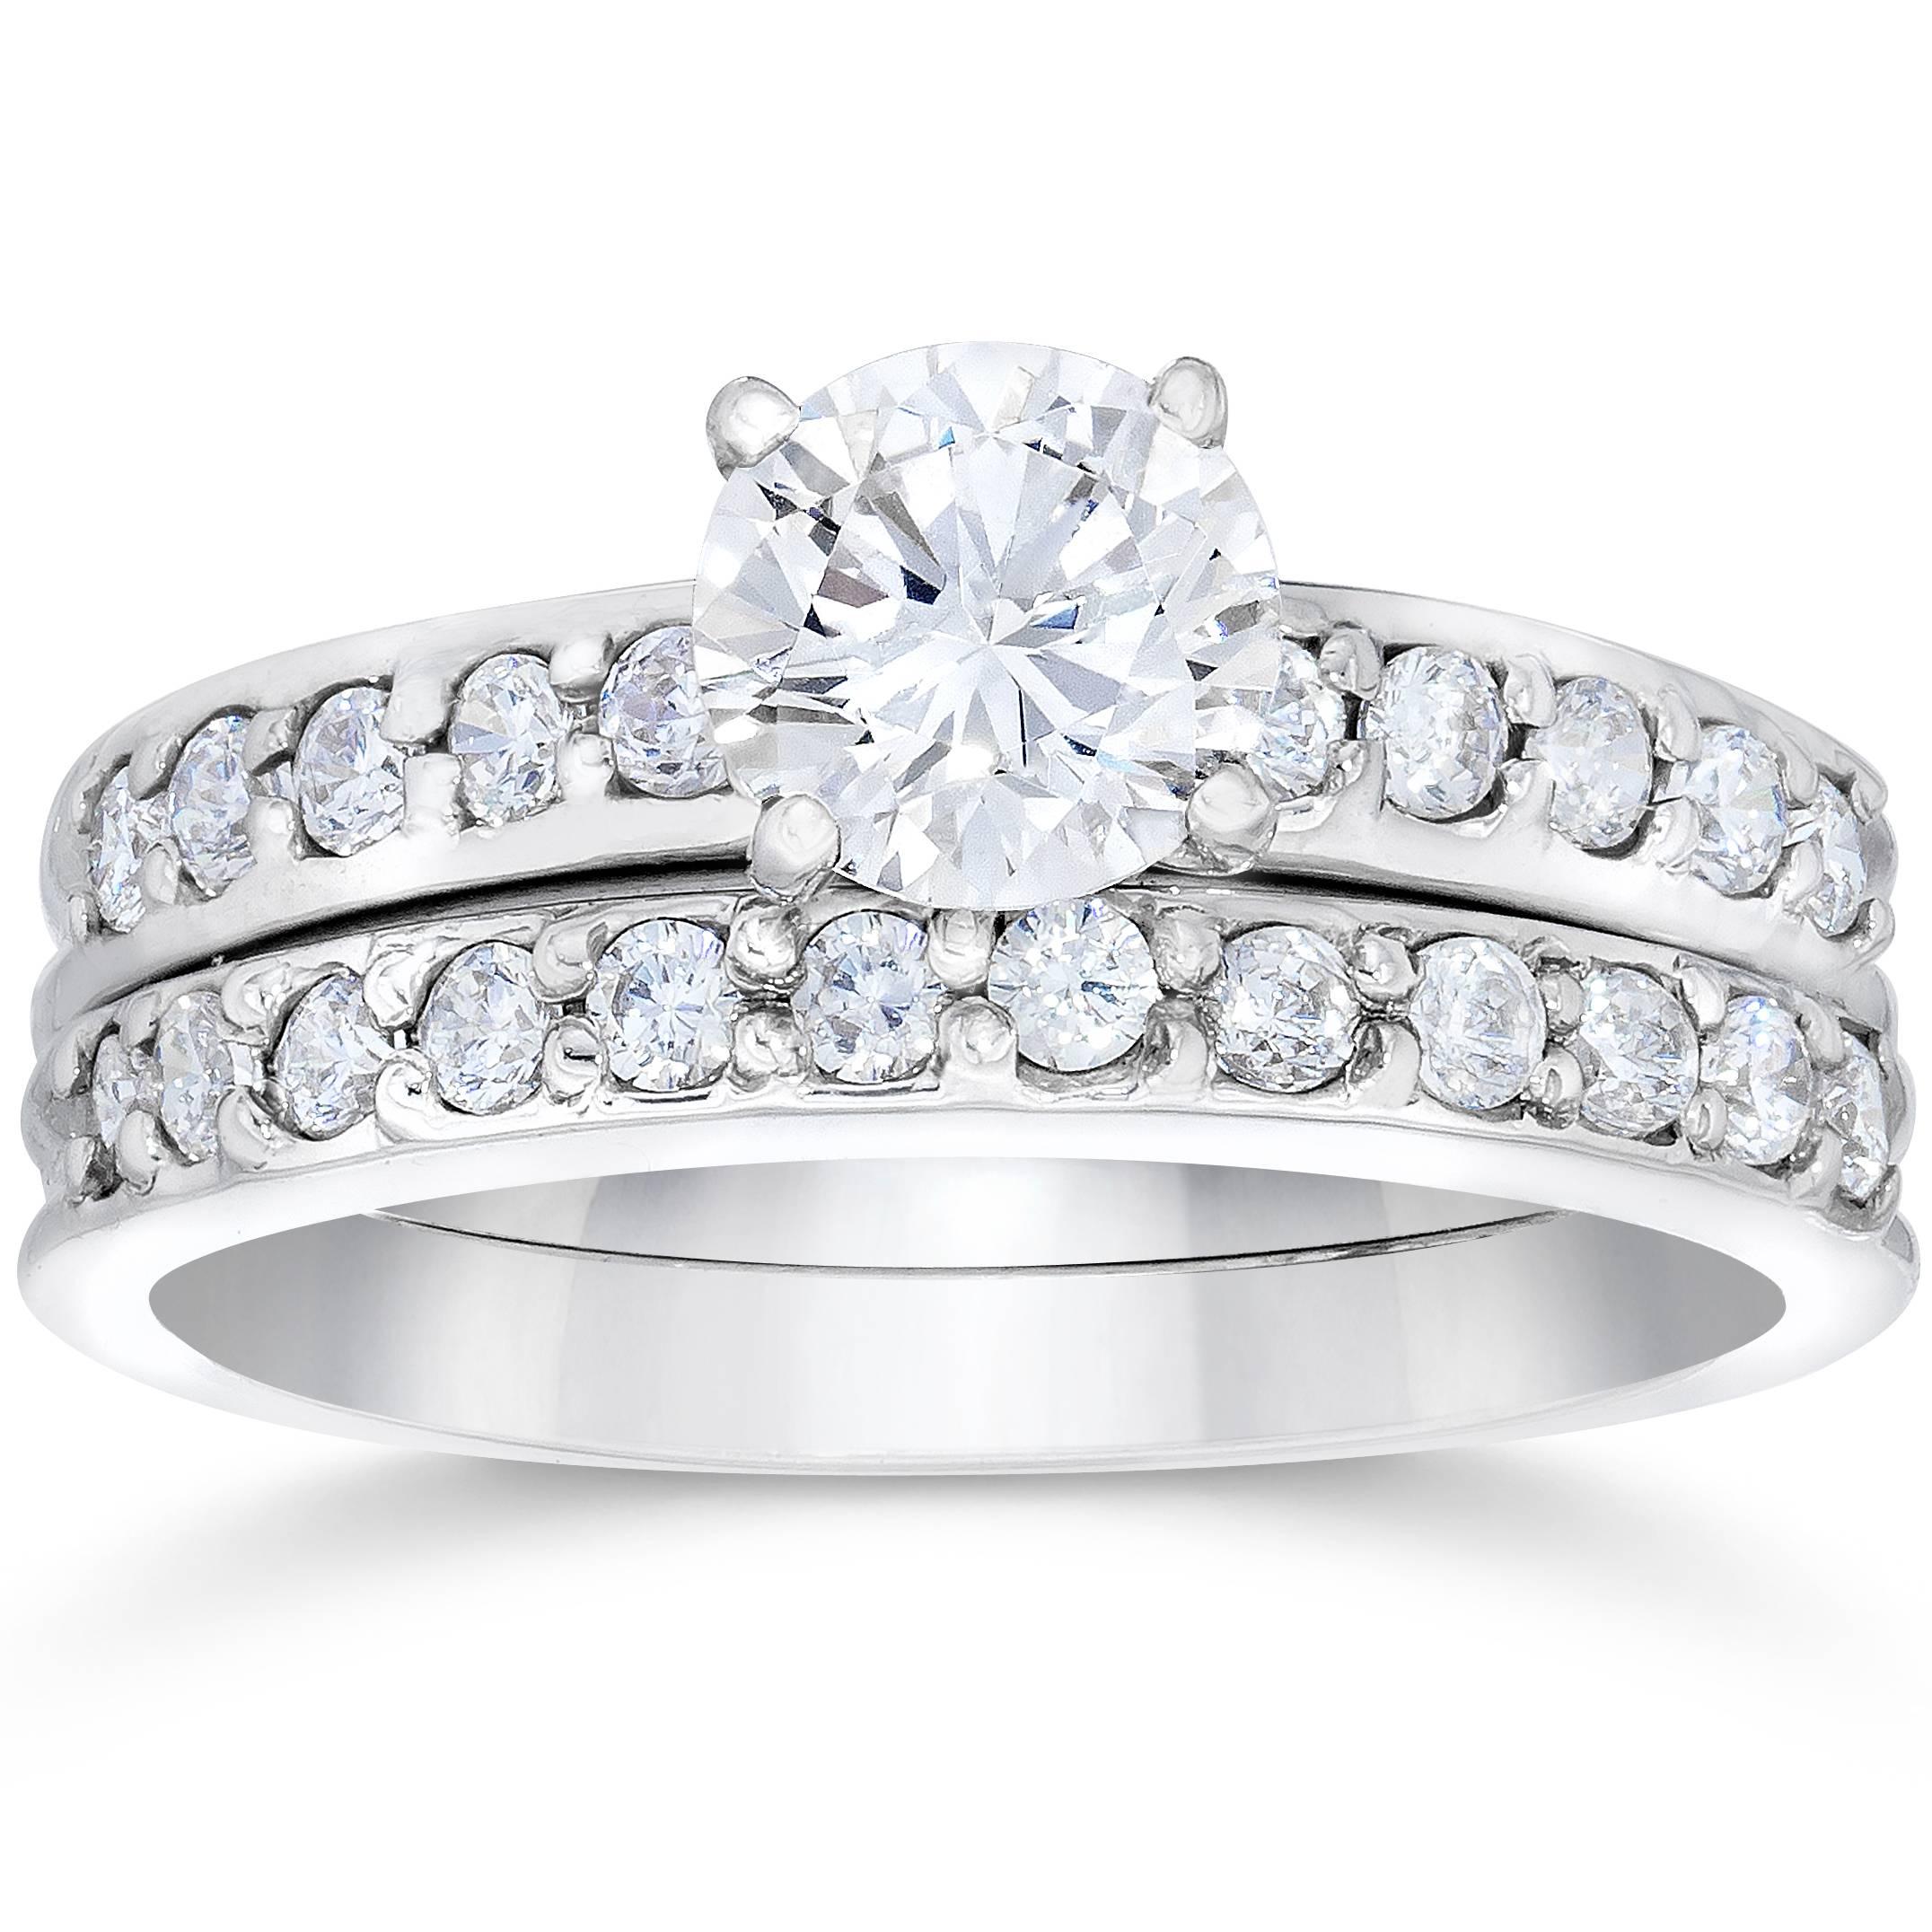 Matching Diamond Engagement And Wedding Ring 1 46ct: 1 Carat Genuine Diamond Engagement Matching Wedding Ring